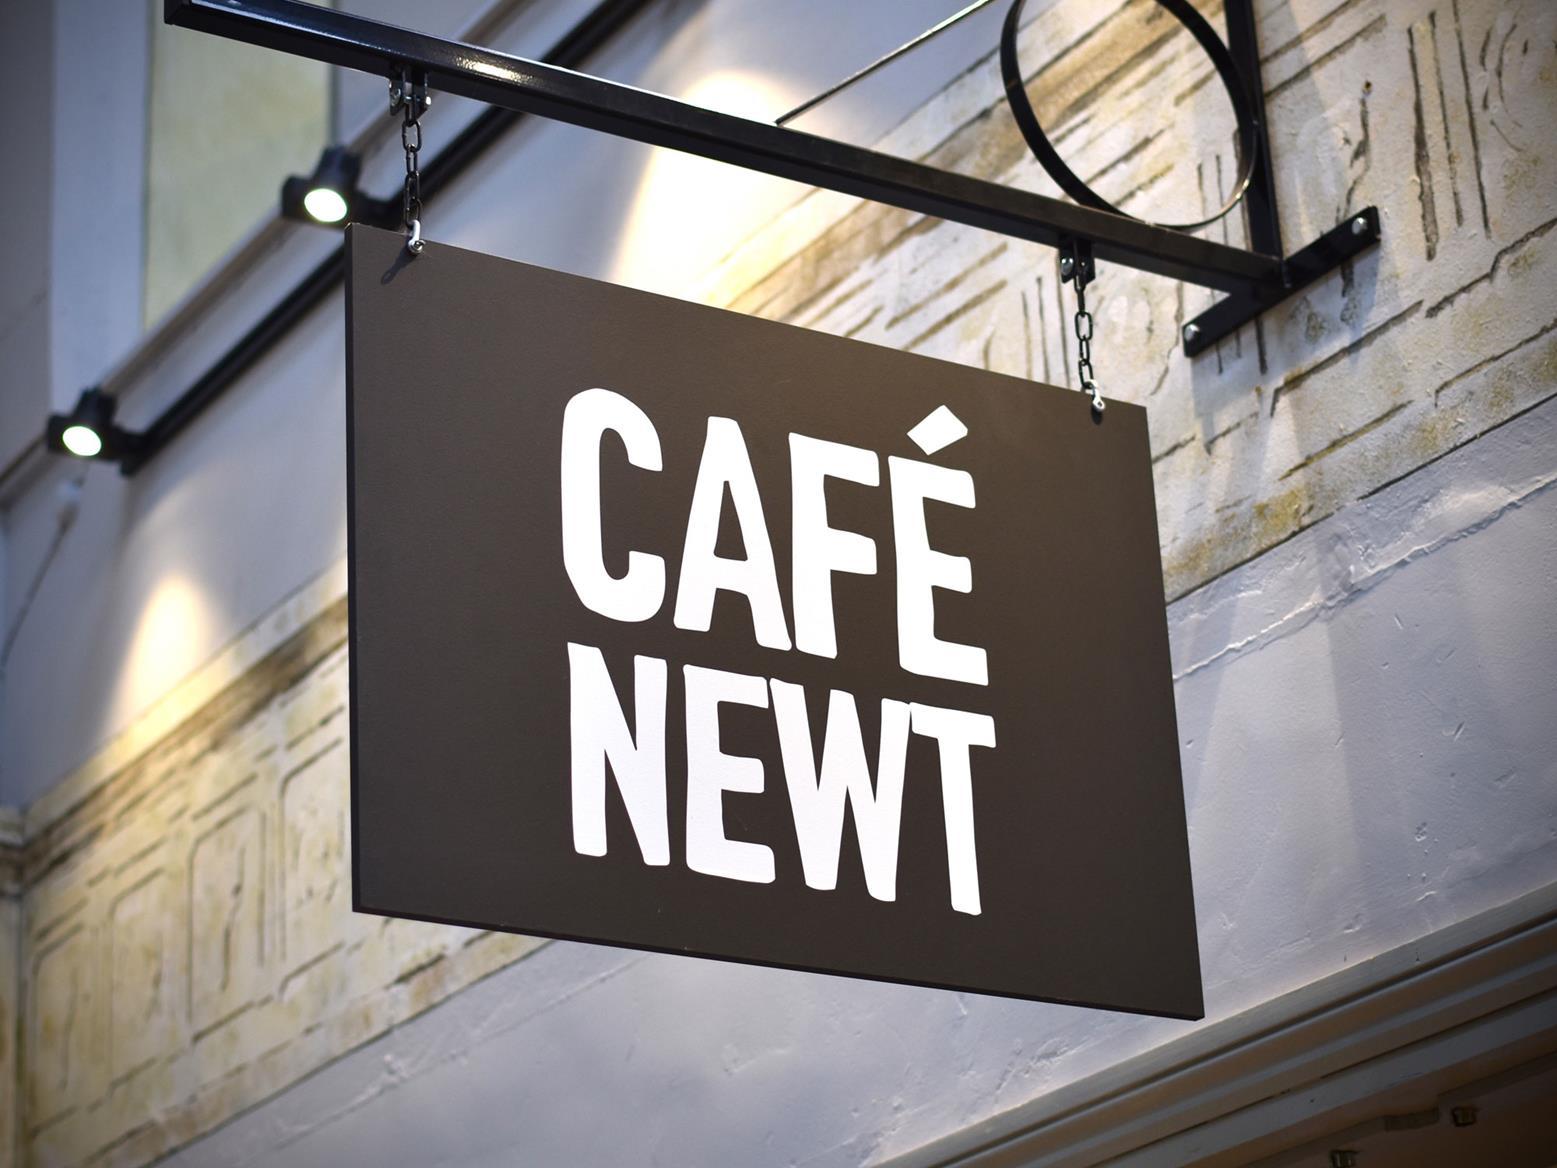 Cafe Newt sign